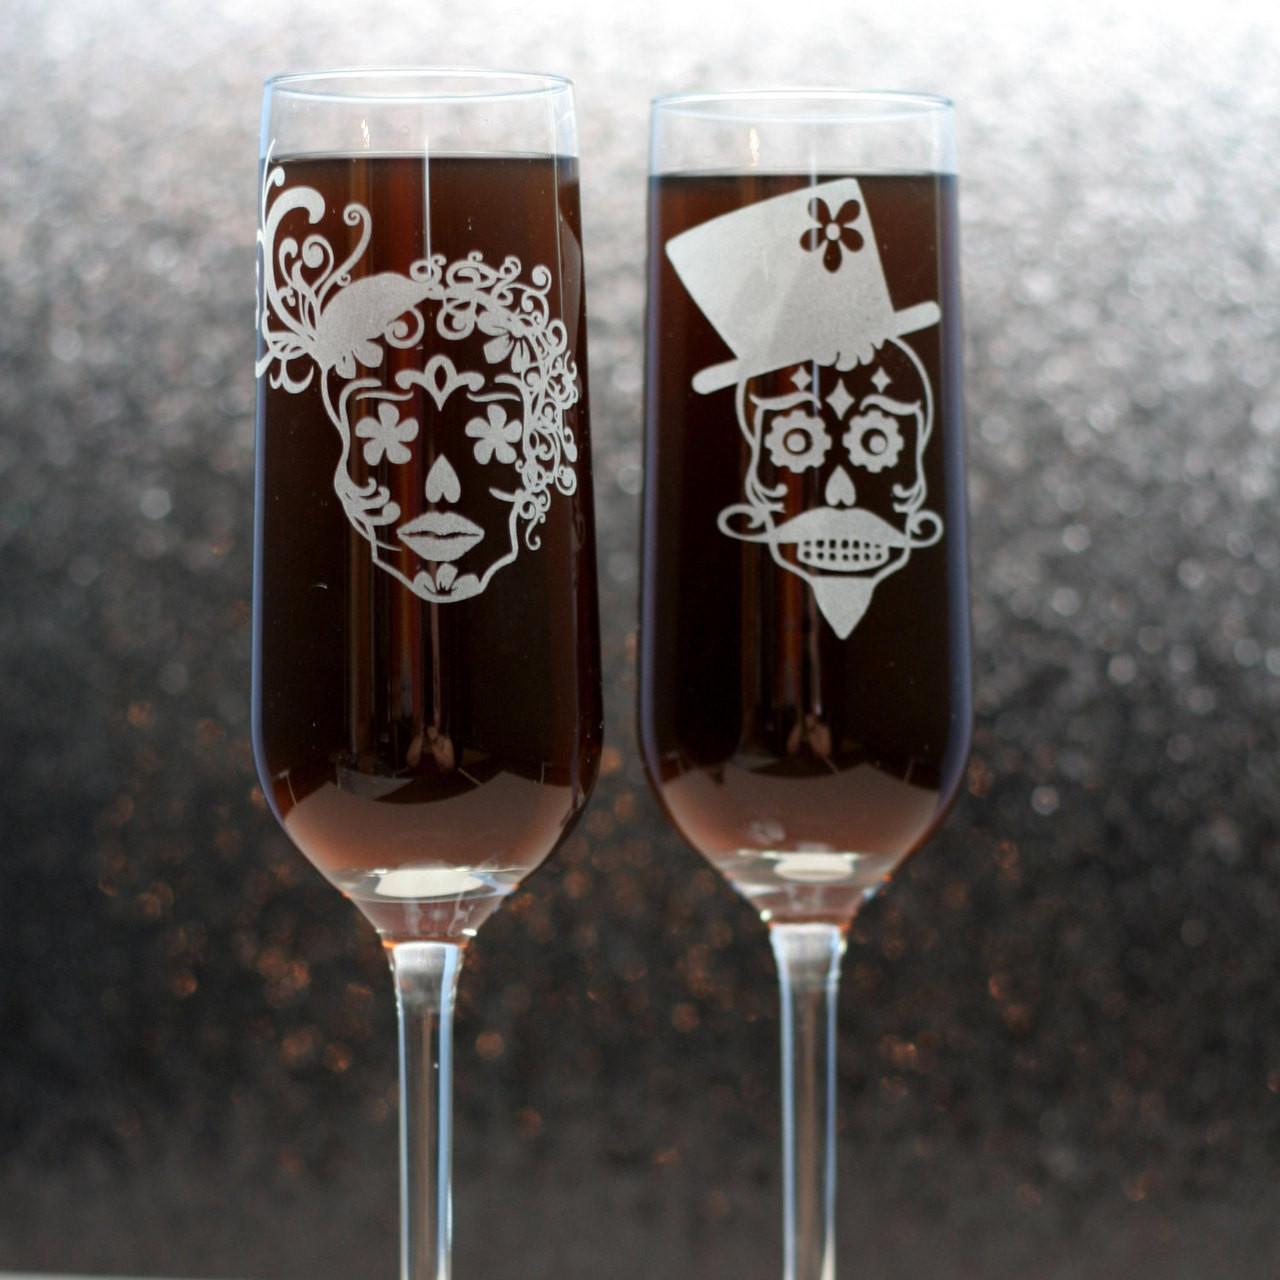 Wedding Gift Champagne Flutes: Sugar Skull Couple Engraved Wedding Champagne Flutes